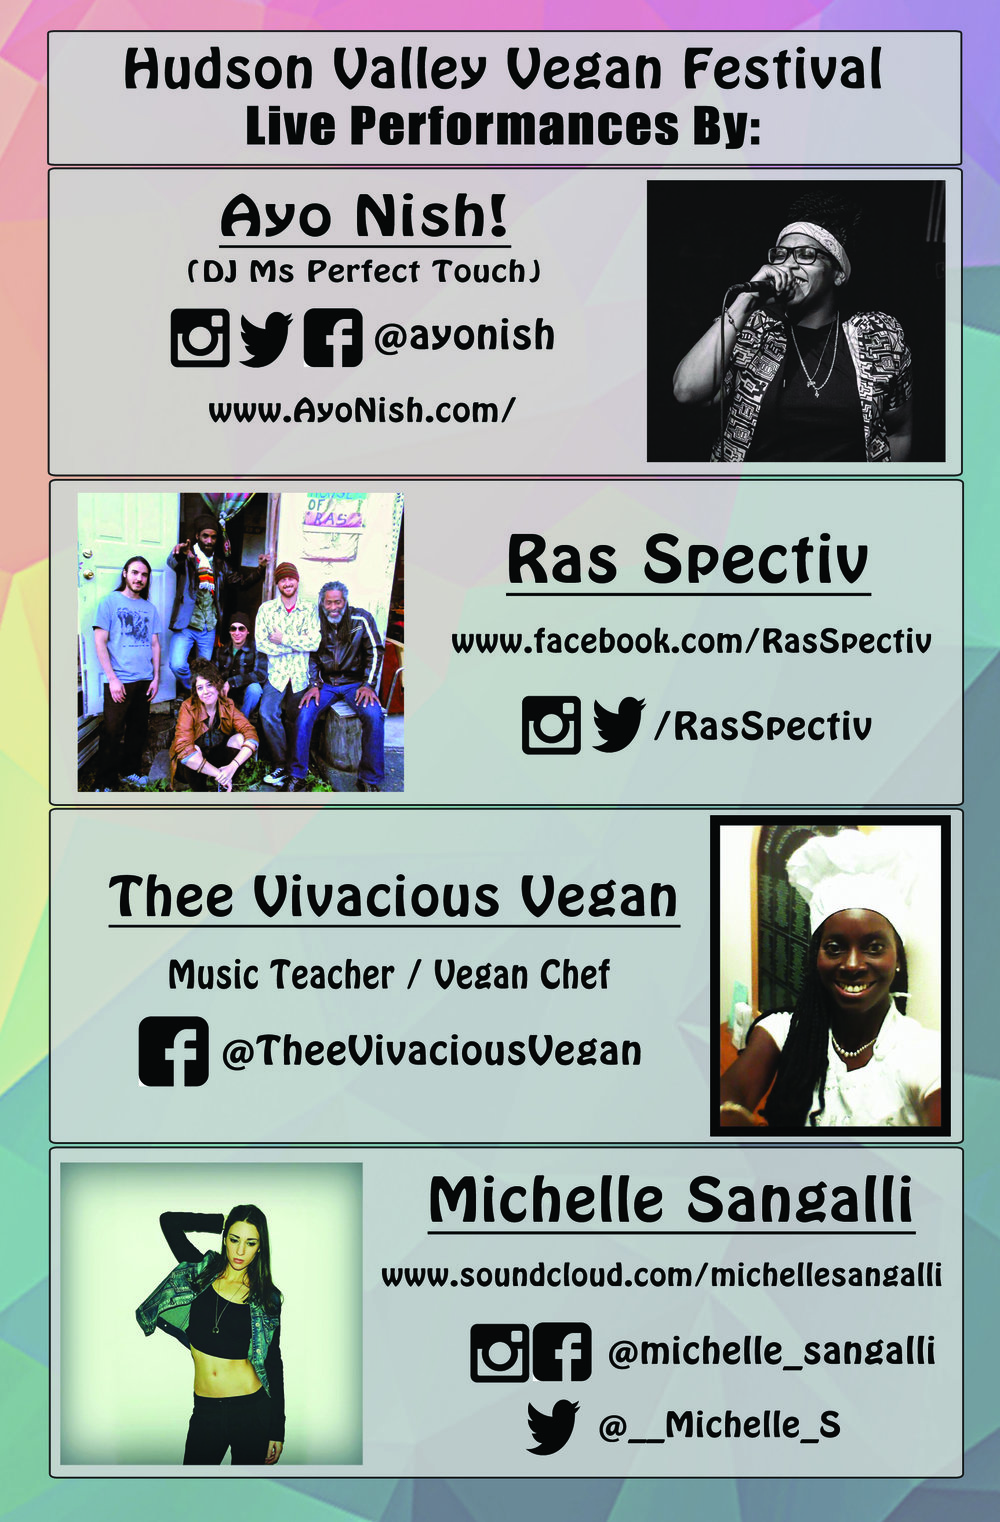 Page 15 - HVVegan Fest Program.jpg